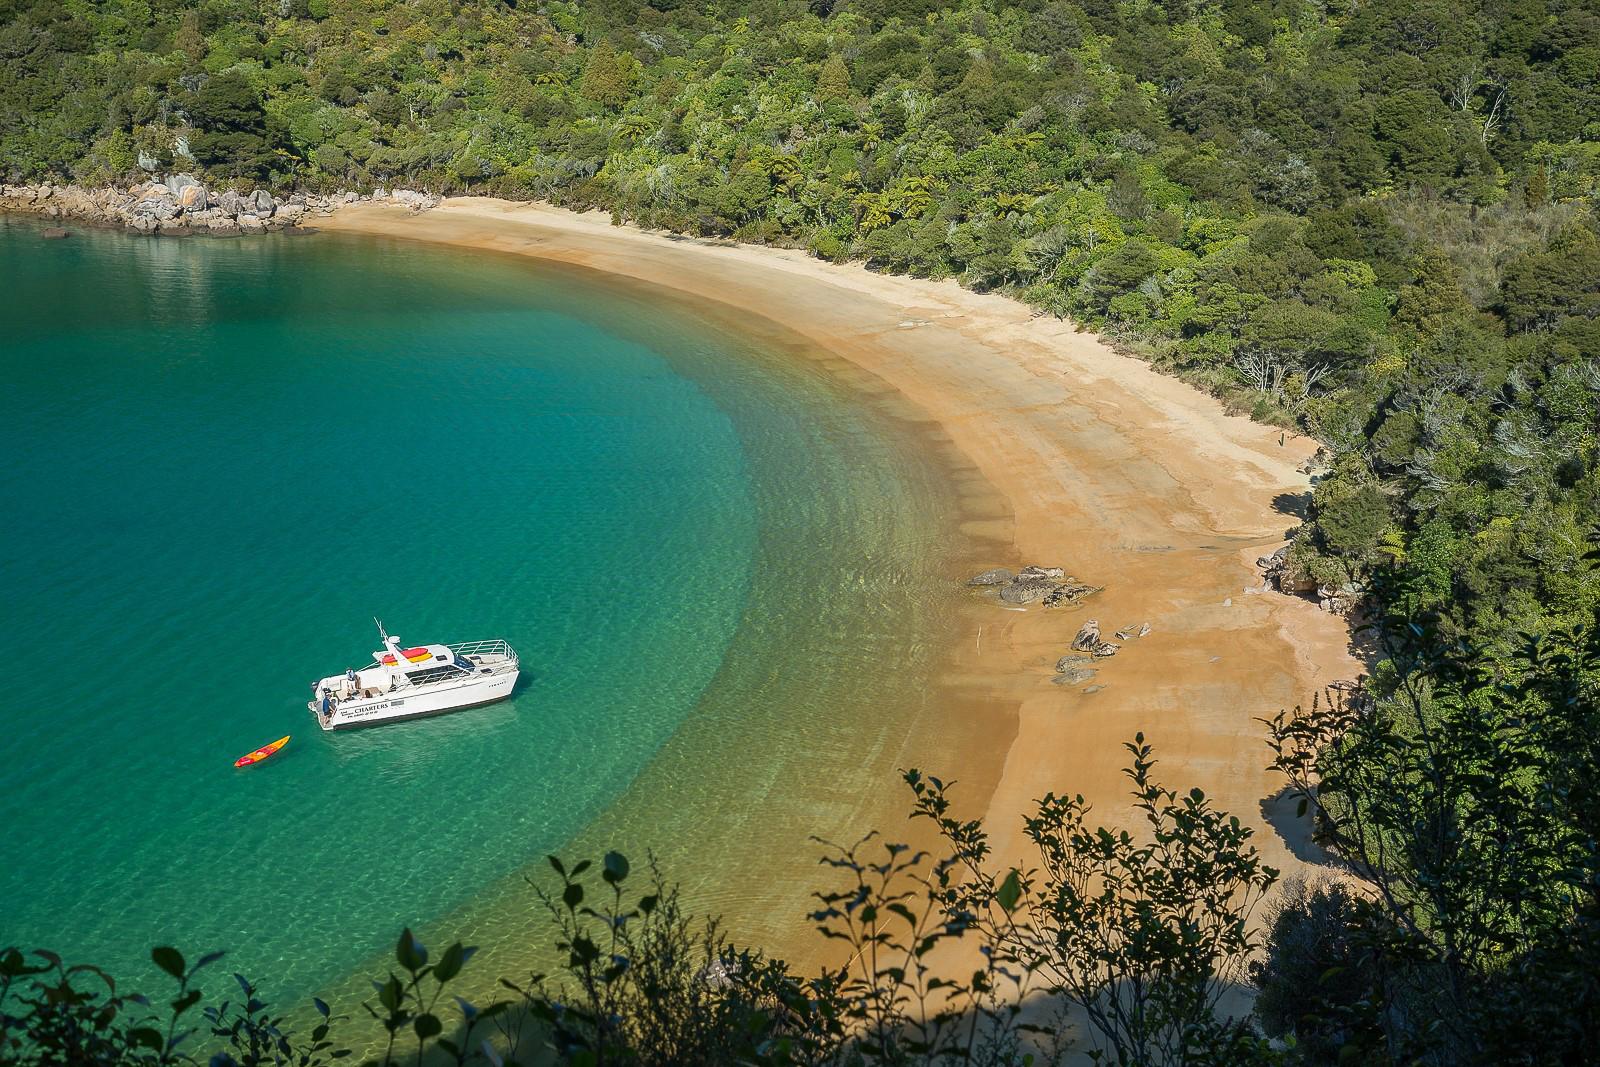 Abel Tasman Private Boat Charters